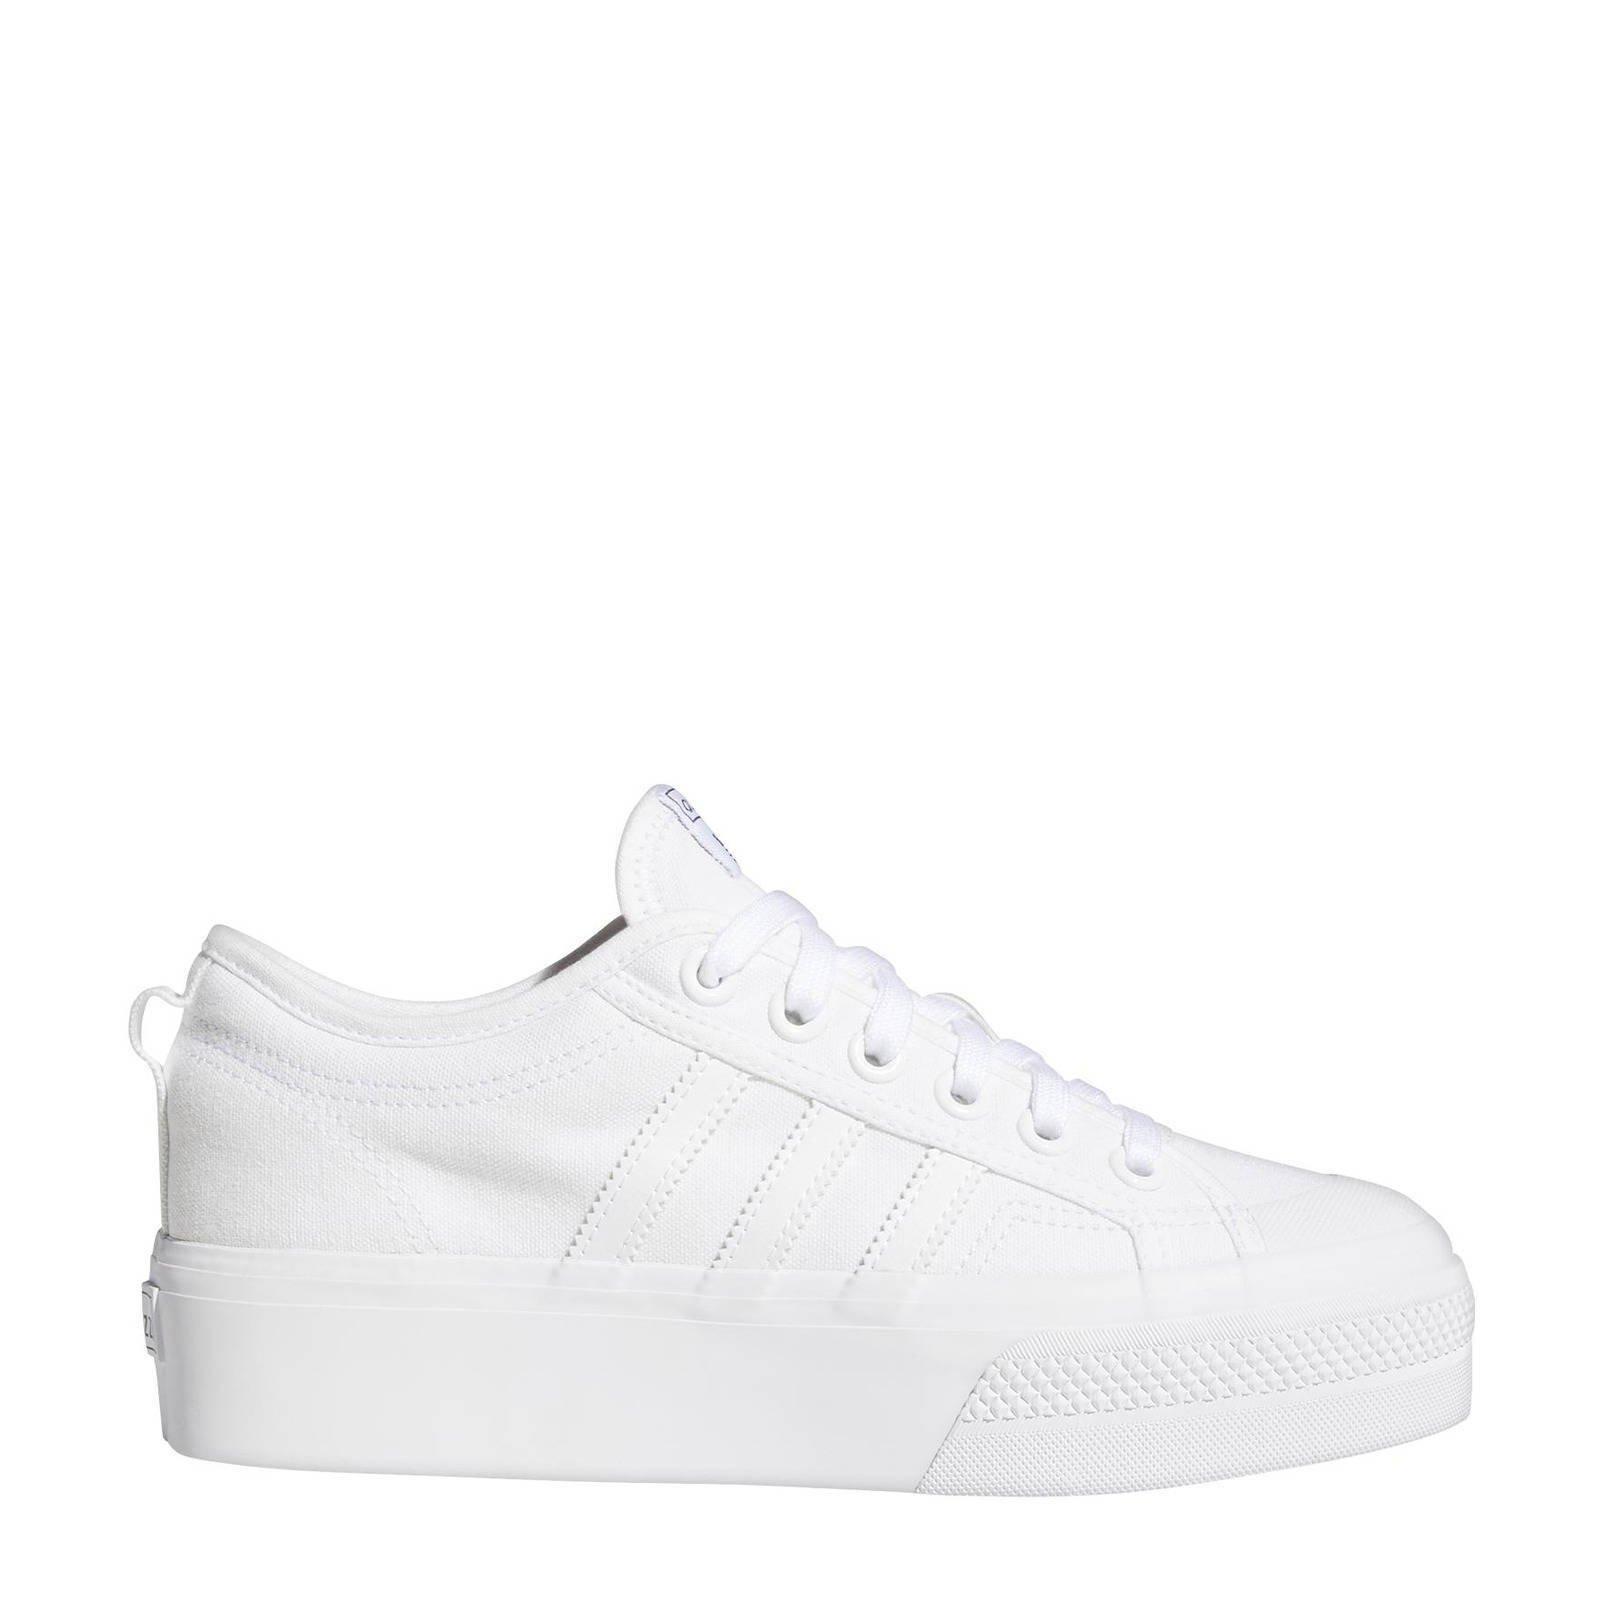 Adidas Originals Nizza Platform Schoenen Cloud White / Cloud White / Cloud White online kopen